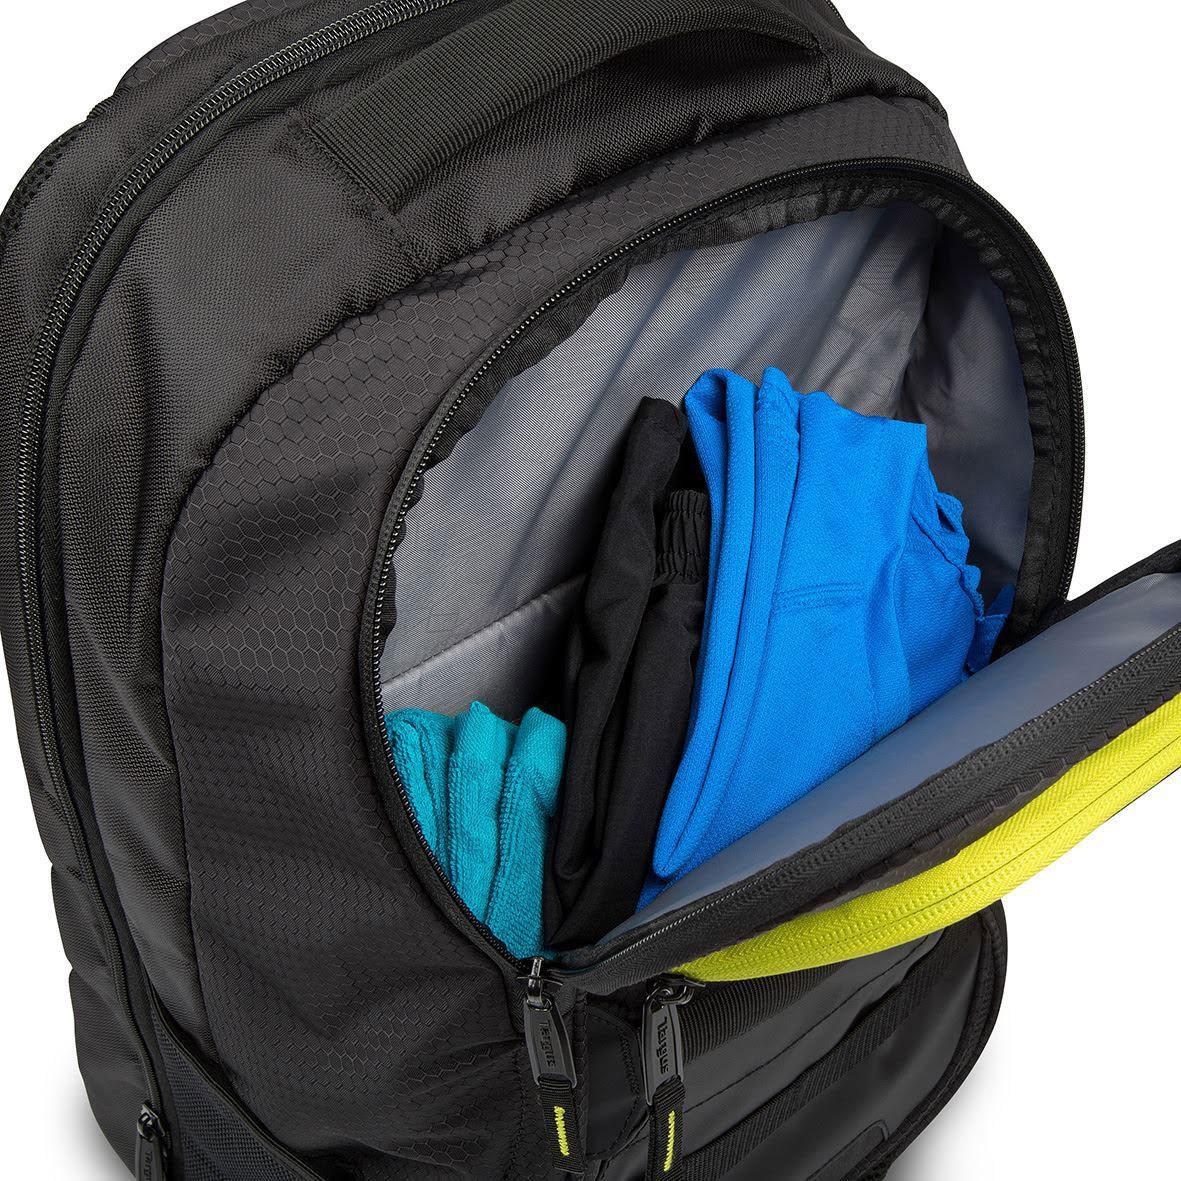 "Stamina 15.6"" Laptop Backpack Targus - Sac et sacoche - 2"